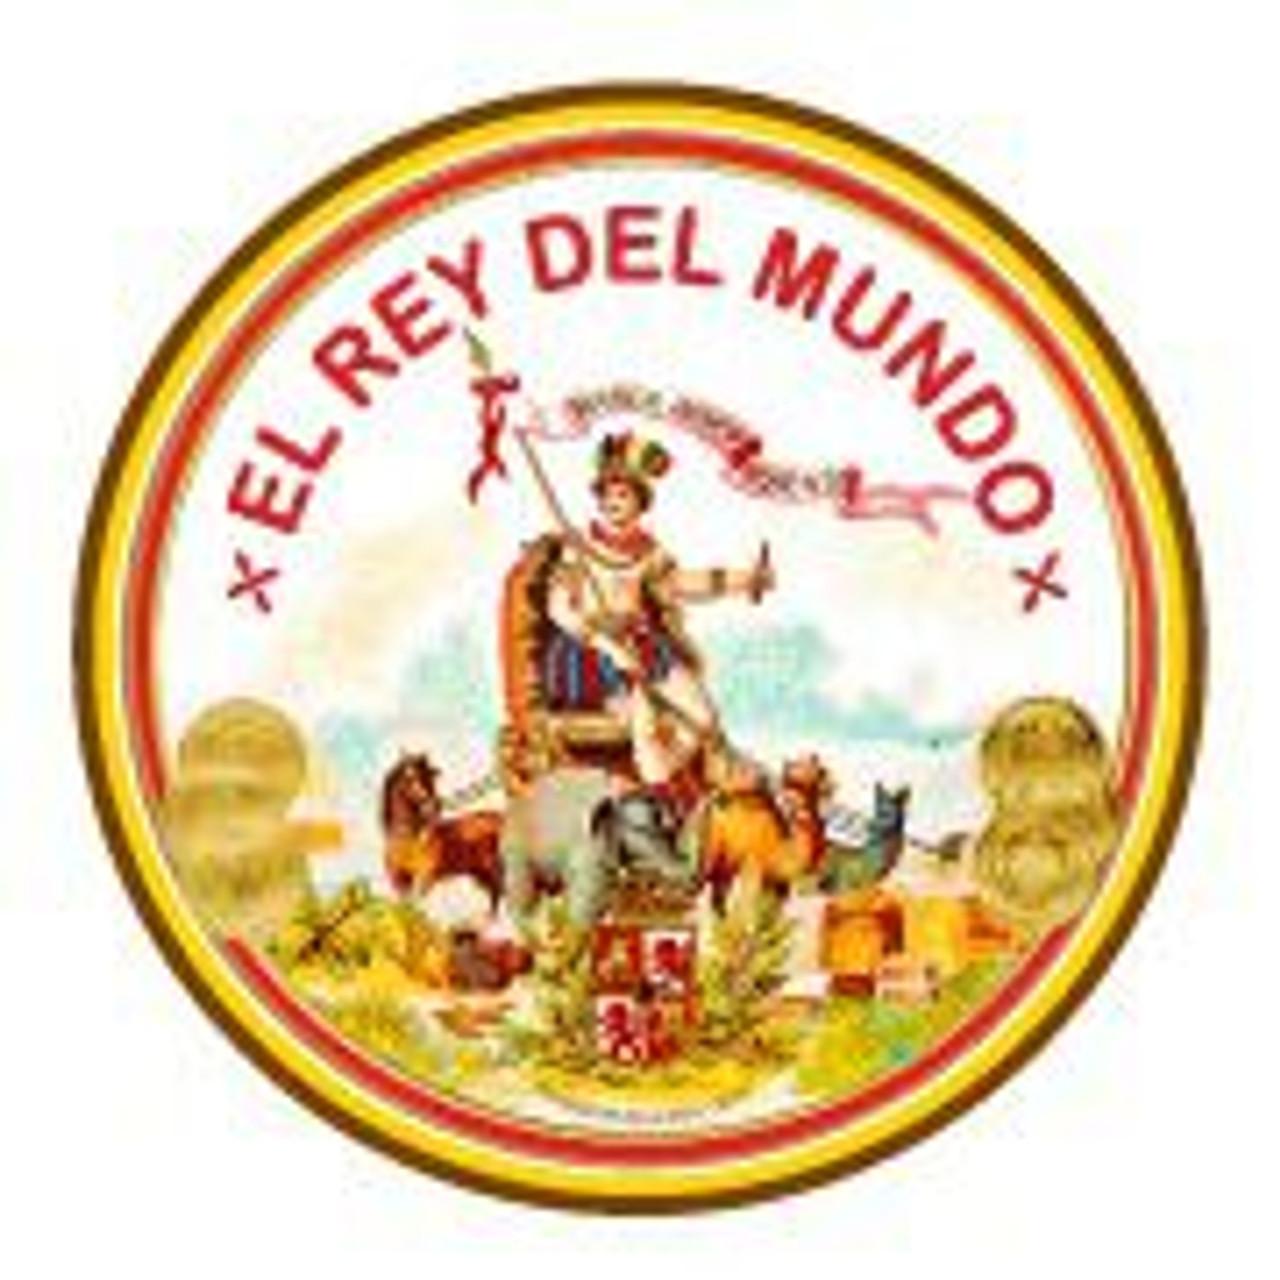 El Rey del Mundo Robusto en Vidrio Cigars - 5.62 x 50 (Box of 20 Glass Tubes)